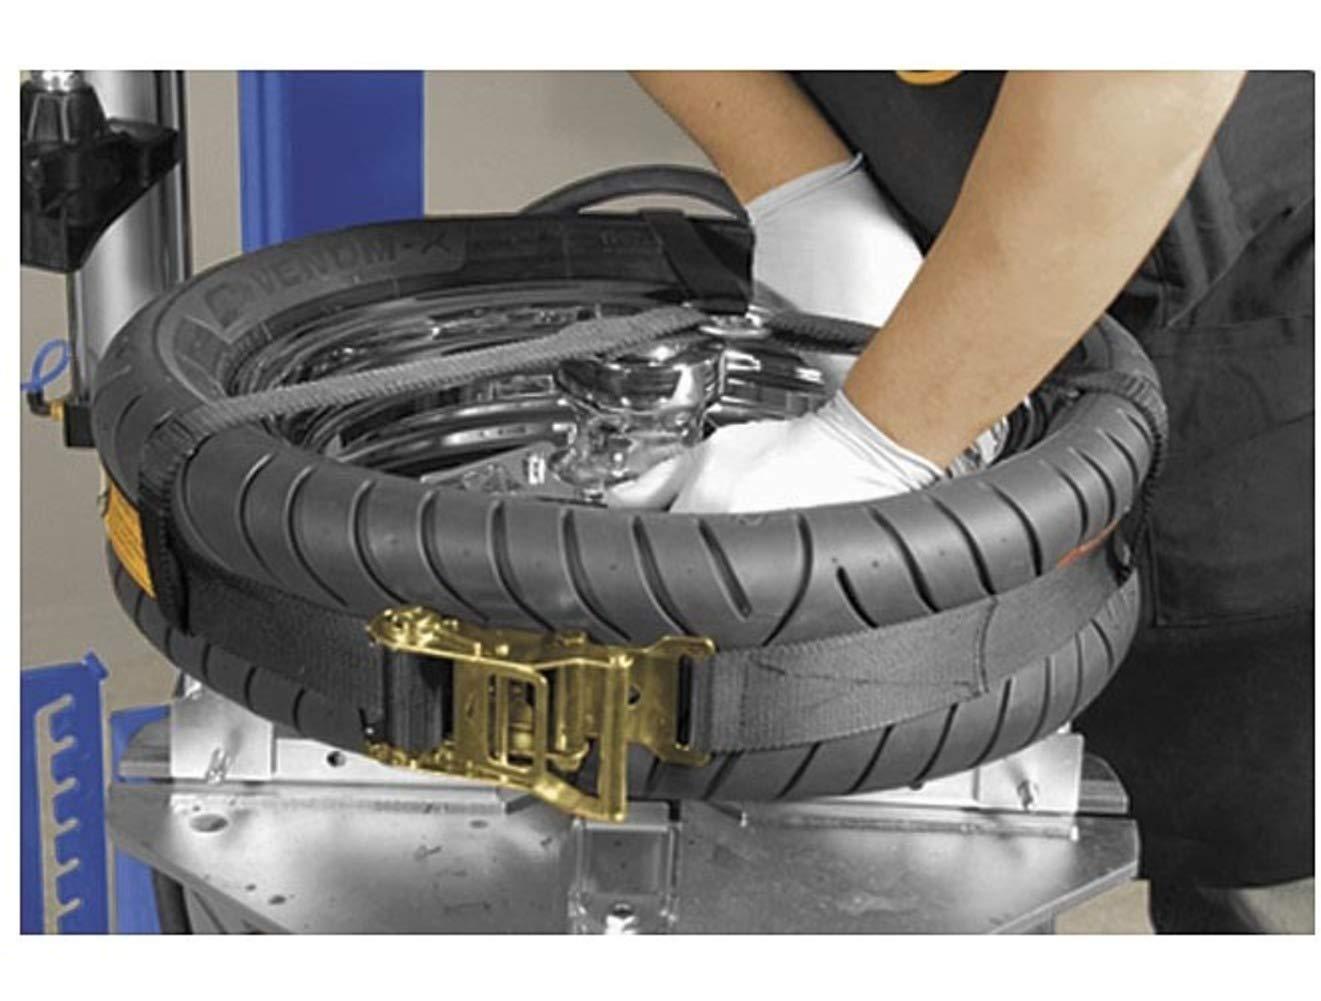 K&L Supply Tire Bead Starter 35-9016 K & L SUPPLY COMPANY